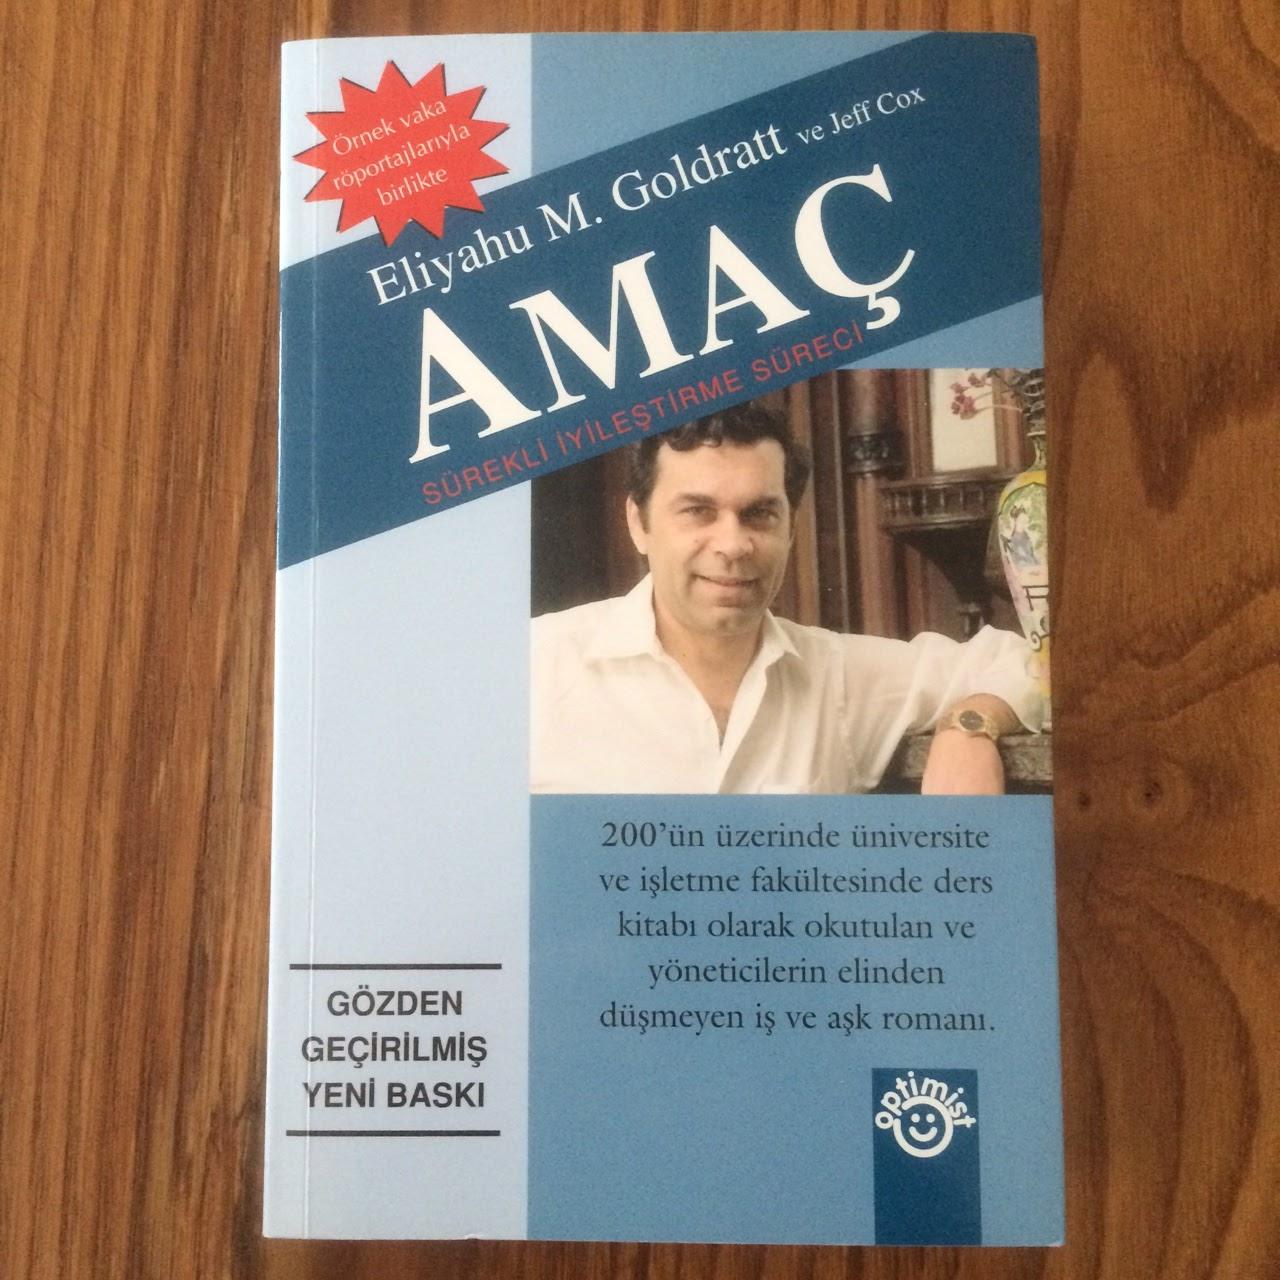 Amac - Surekli Iyilestirme Sureci (Kisitlar Teorisi) (Kitap)